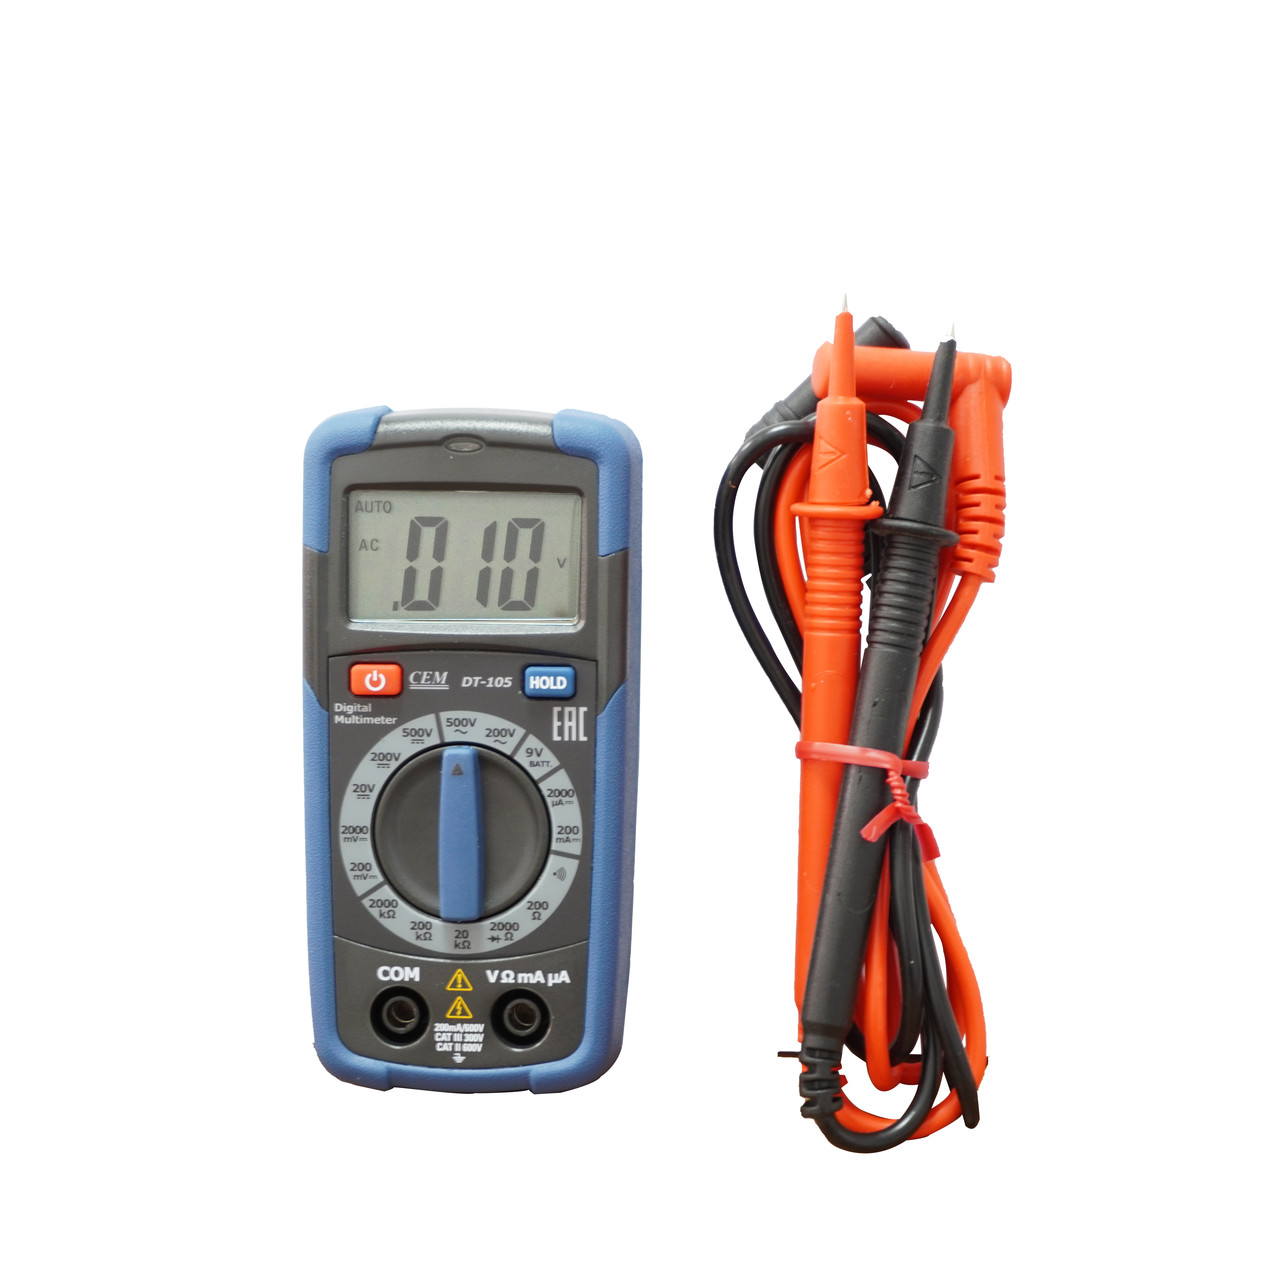 DT-105 Мультиметр цифровой